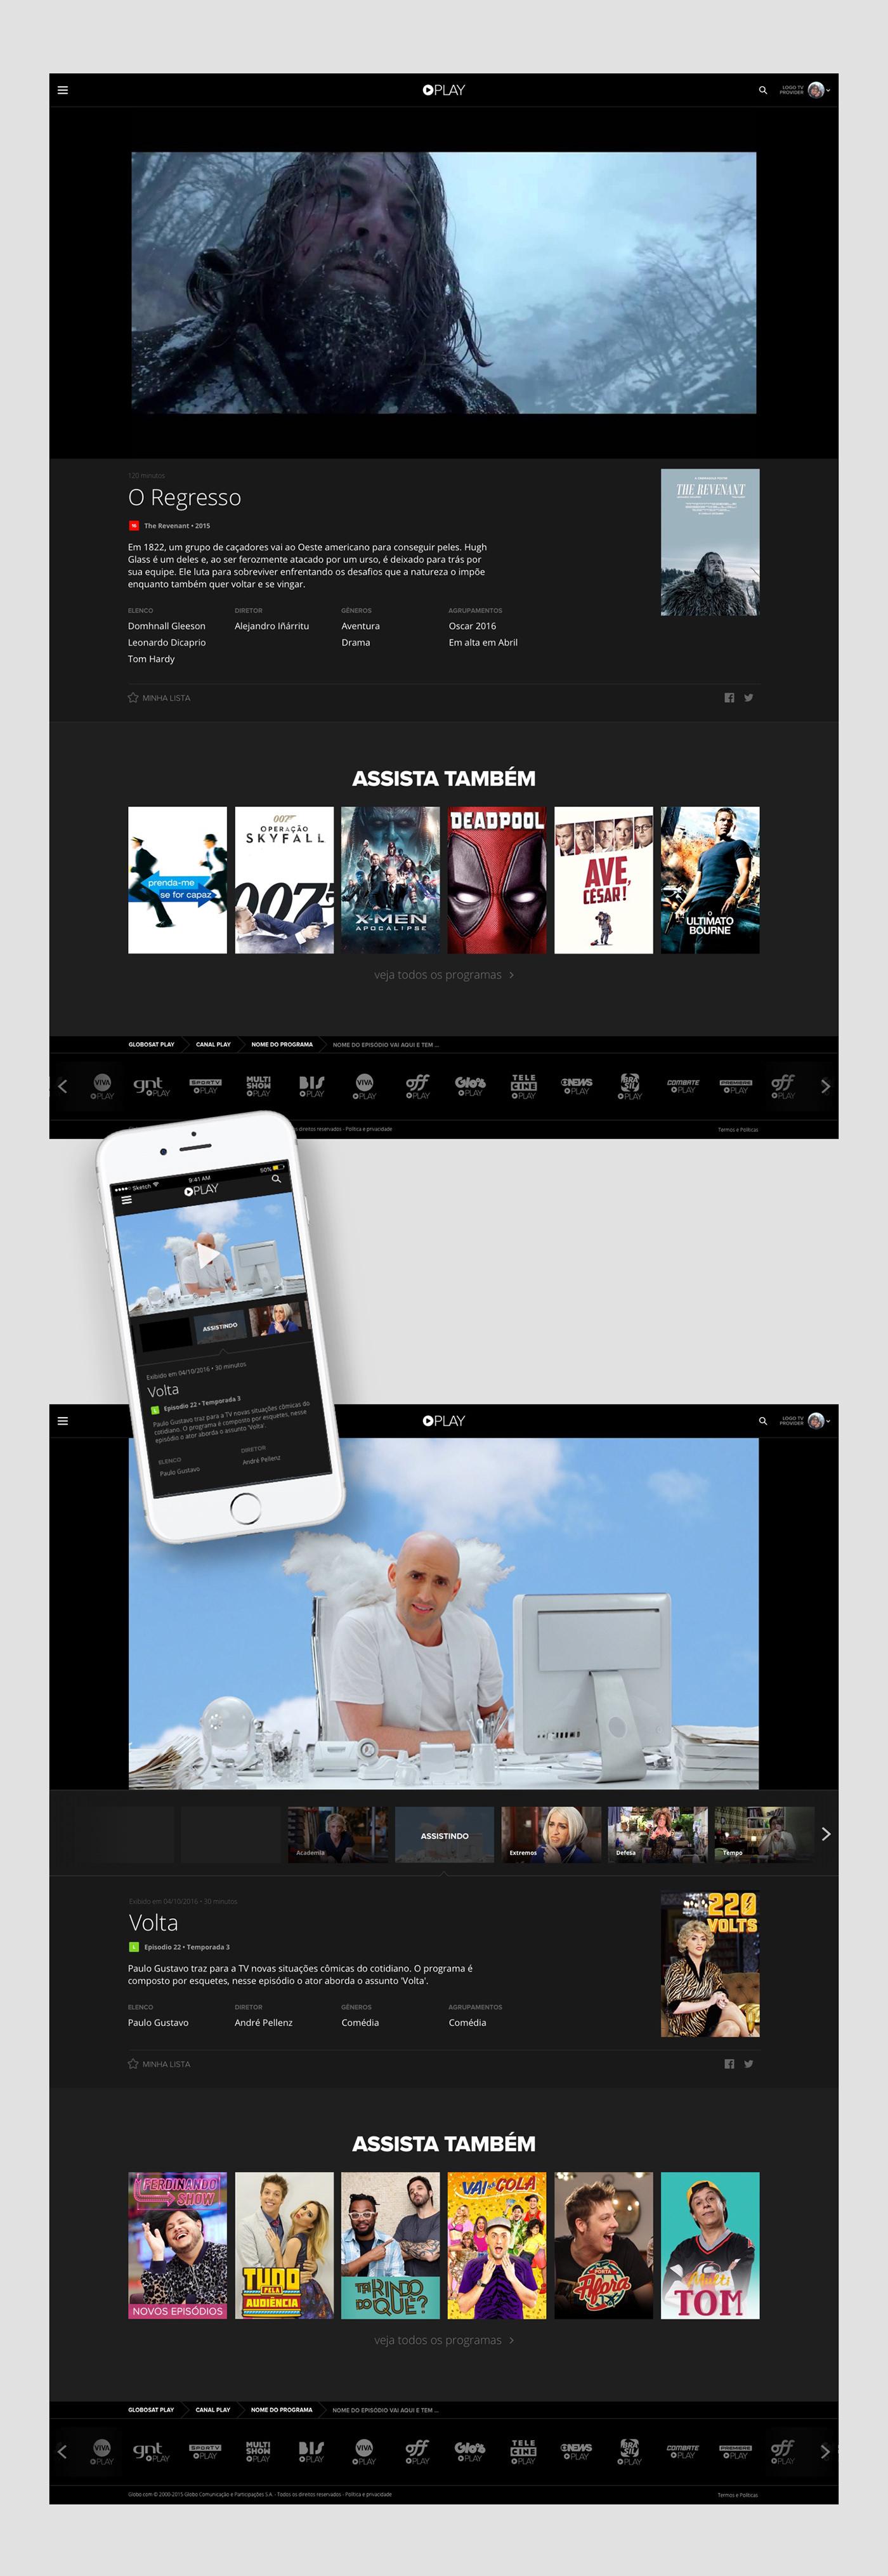 TV Everywhere Movies series VOD Channel Platform UI ux